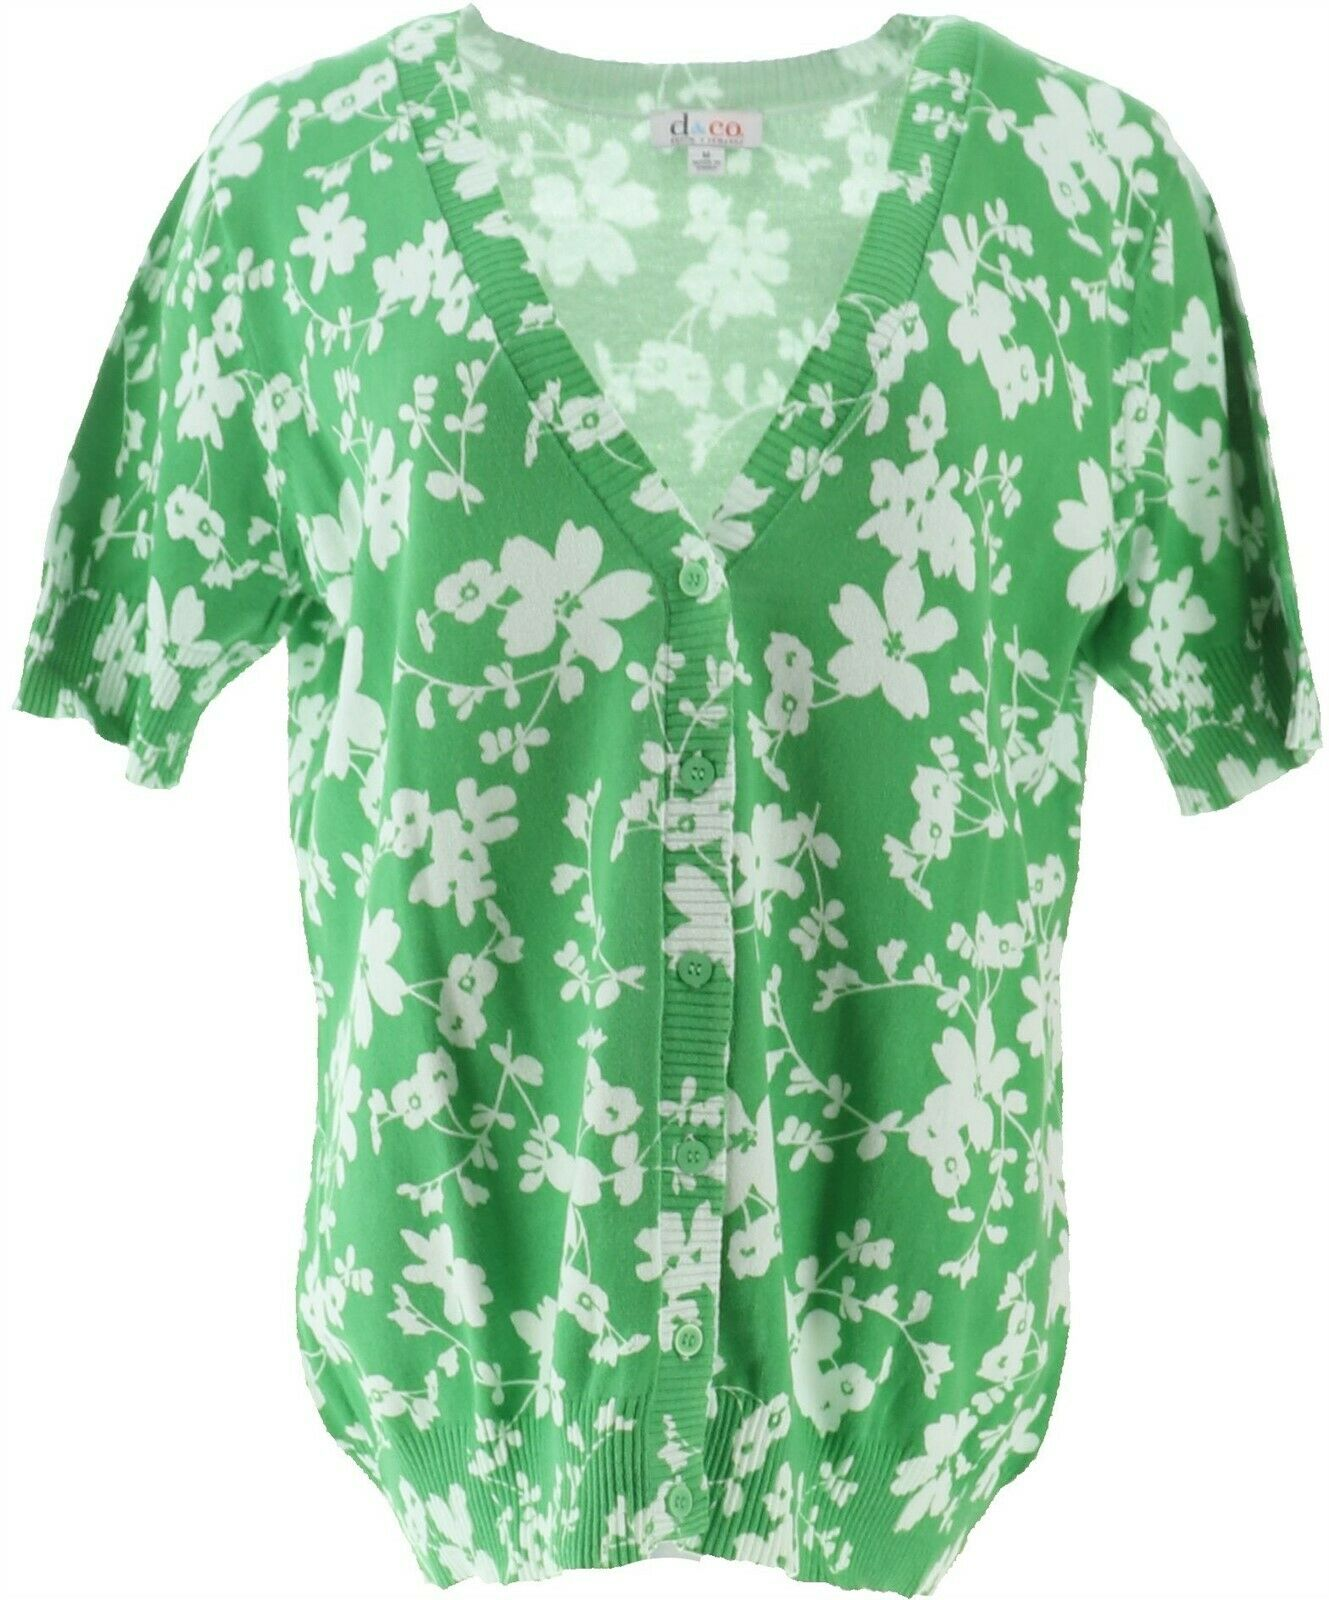 Denim & Co Floral Print Short Slv Button Cardigan